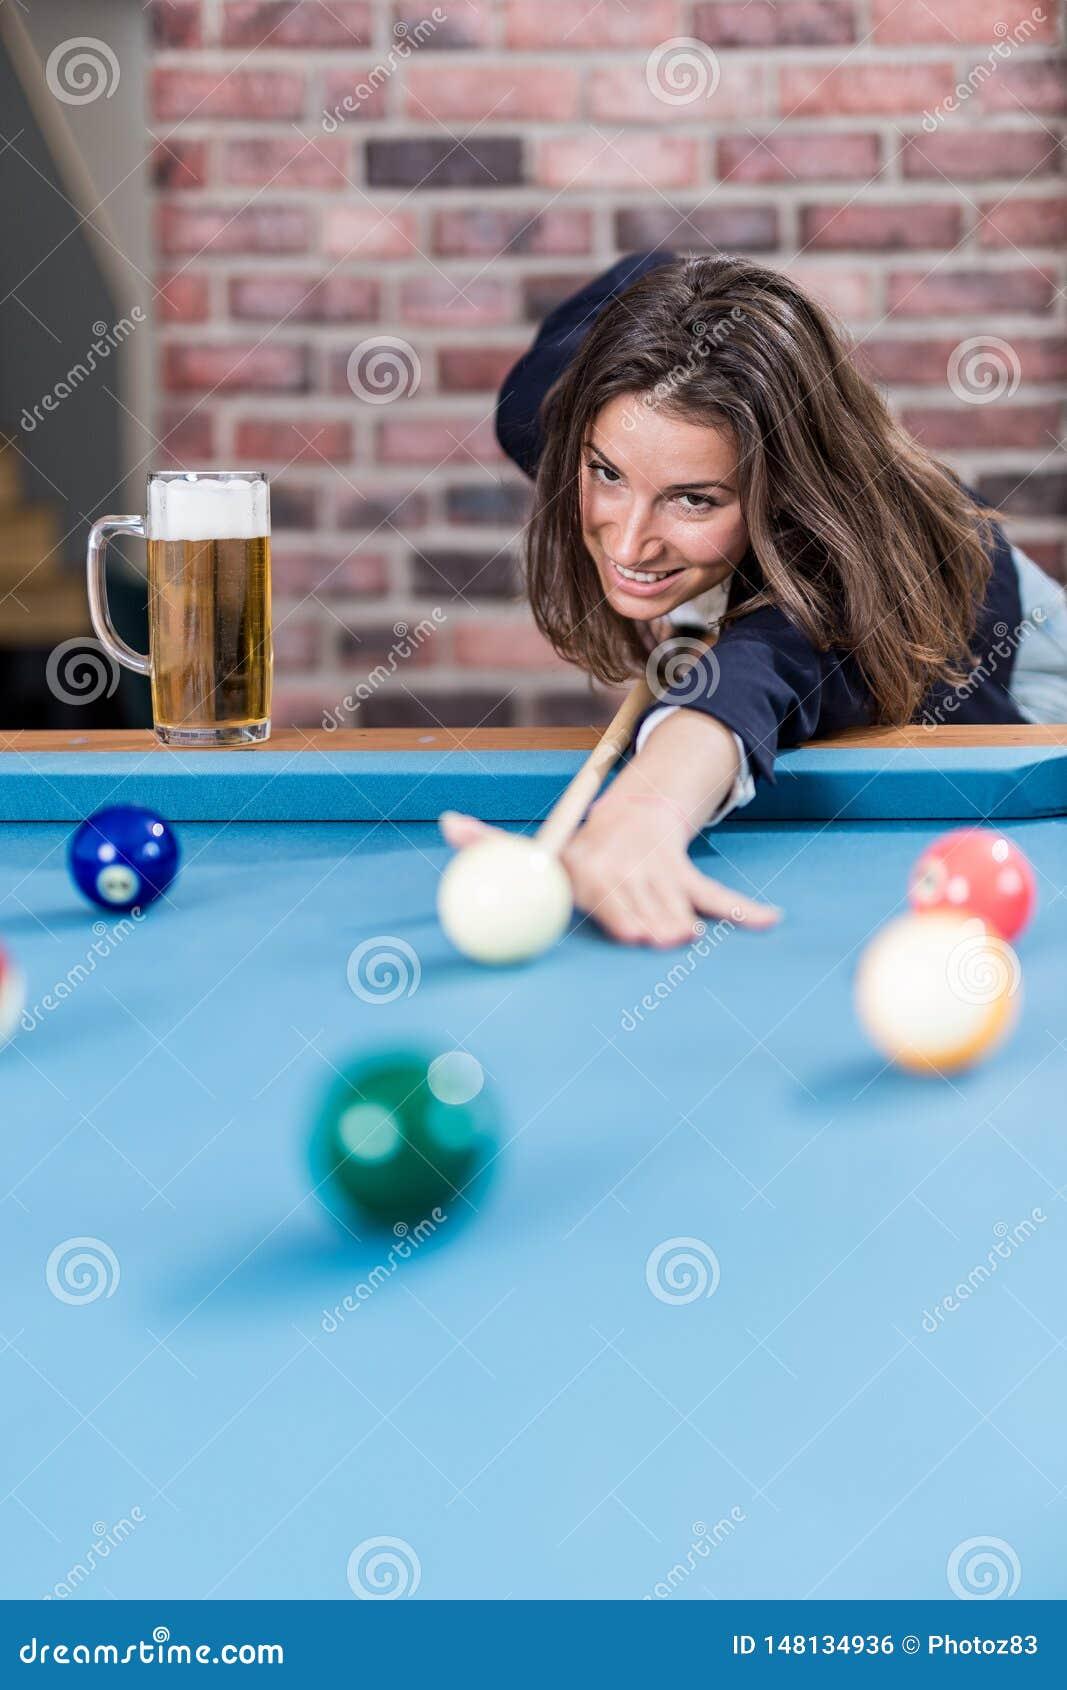 Young beautiful woman playing billiards